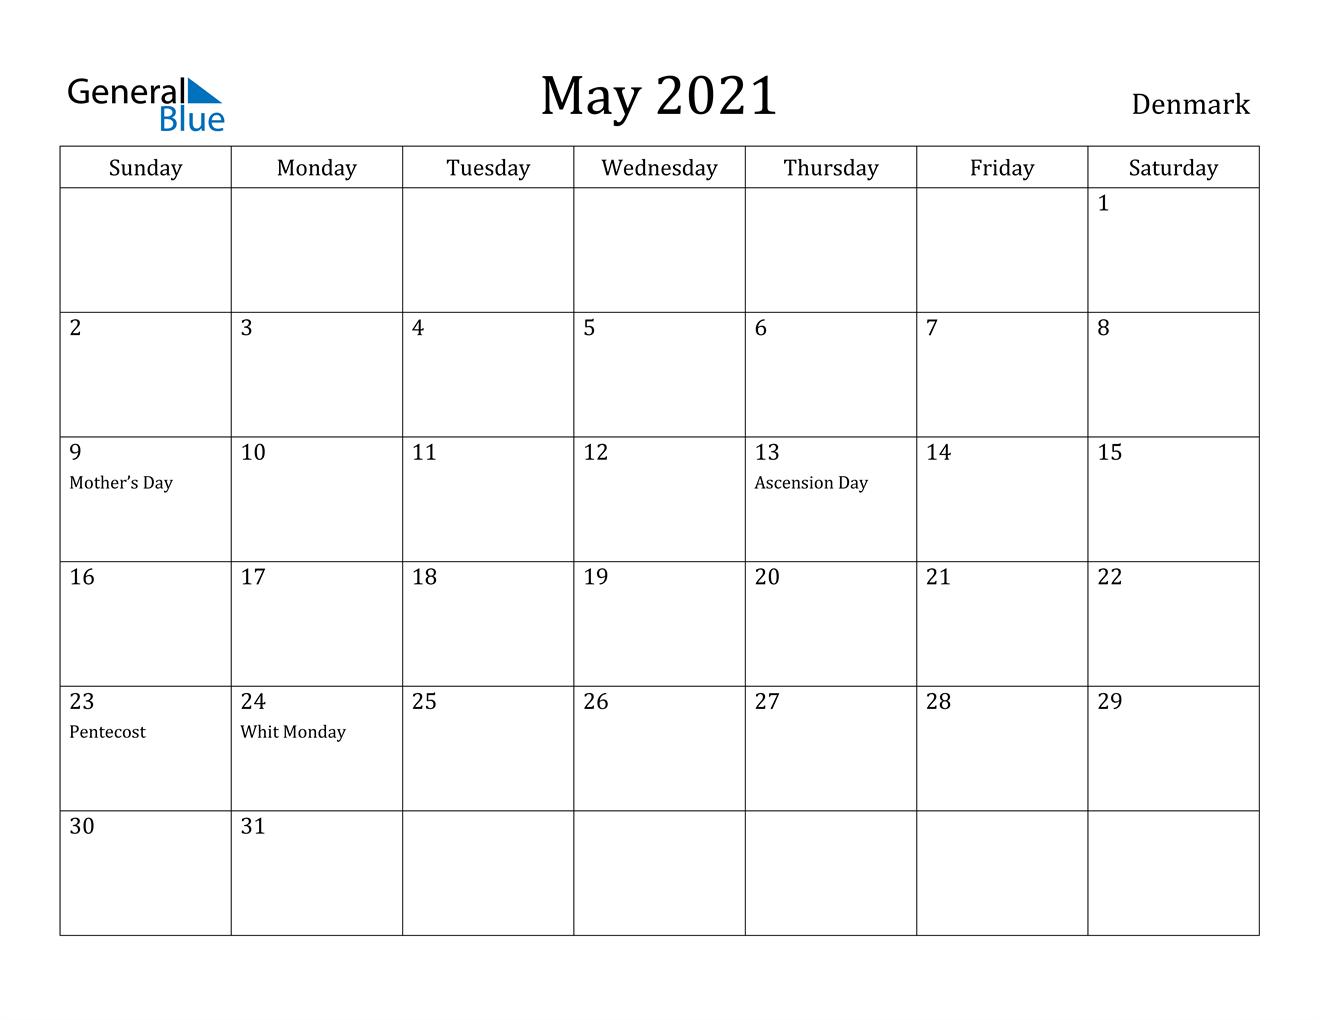 May 2021 Calendar - Denmark